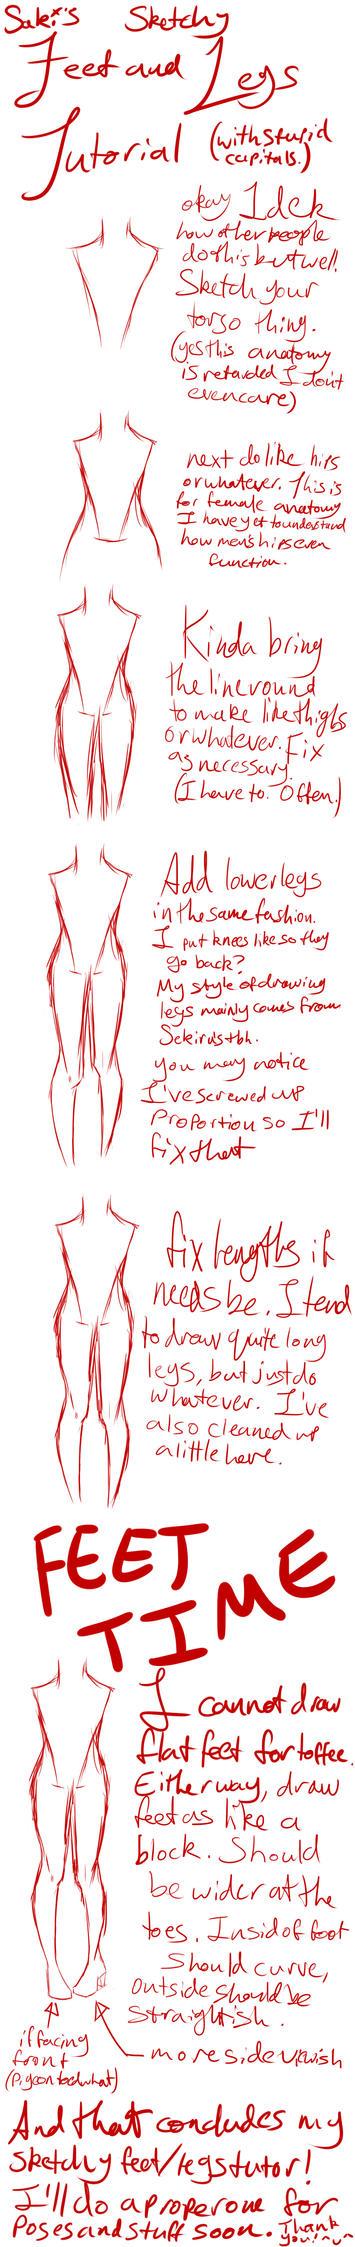 A very sketchy foot and leg tutorial by Sakkeru